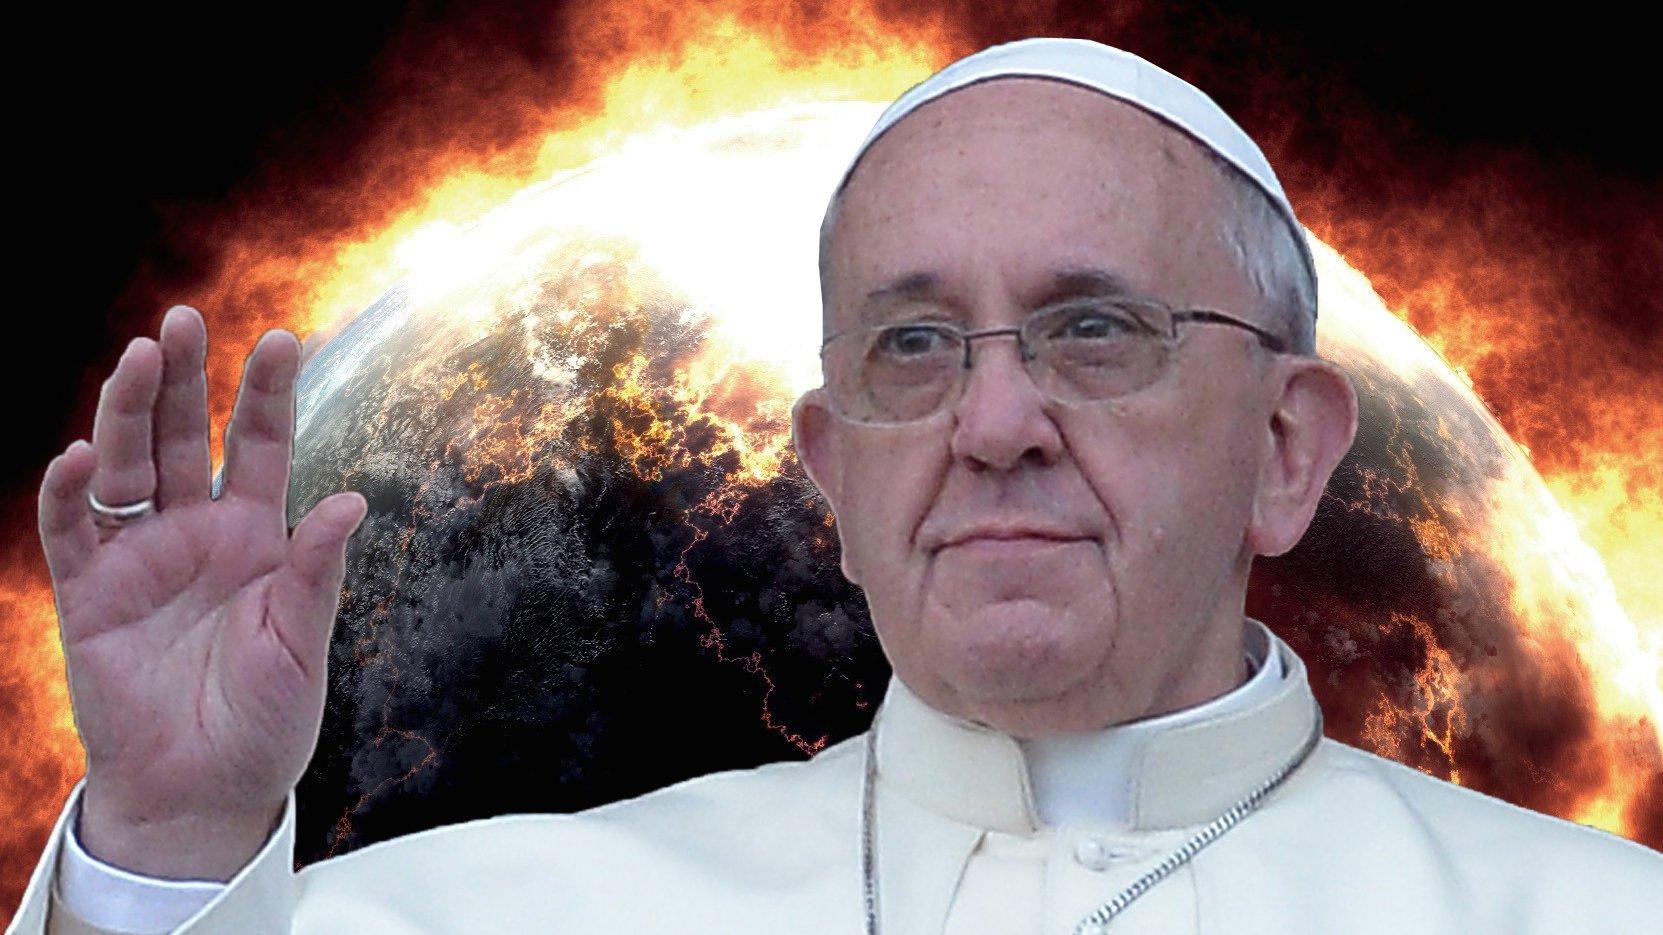 Pope Apoc